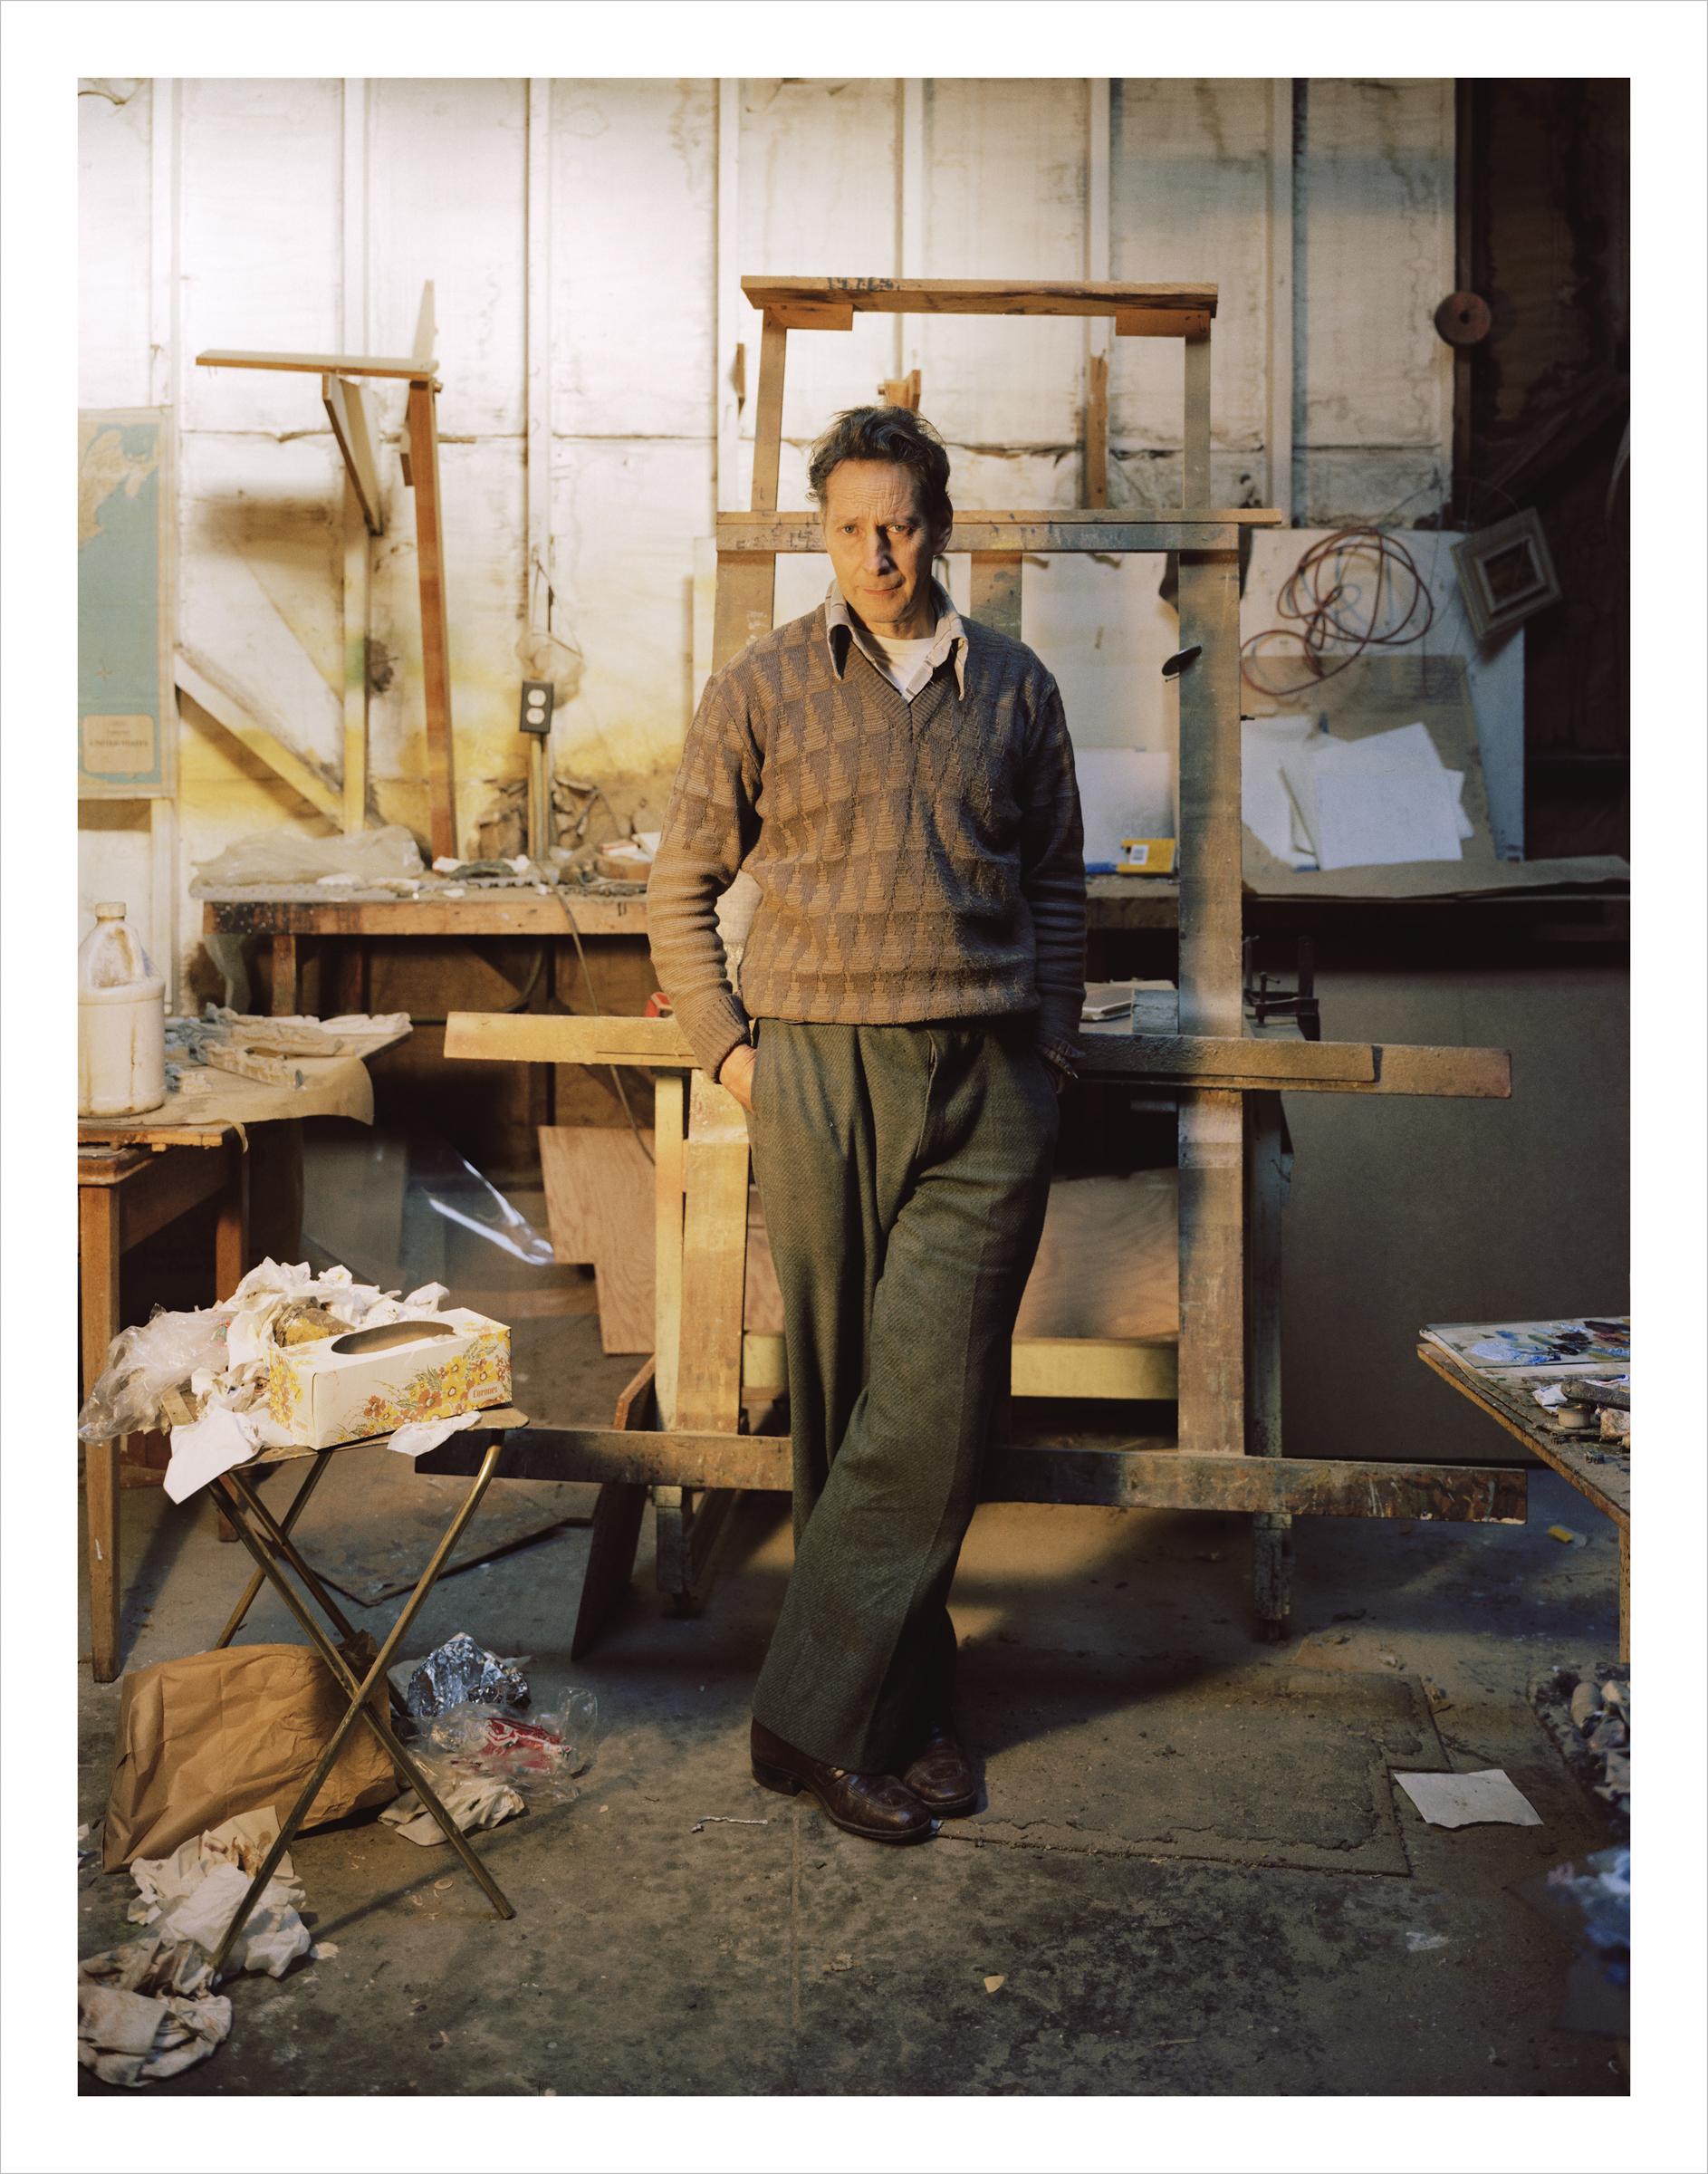 Chilean artist Ivan Garcia in his studio, 73 Langton Street Archival Pigment Print, 2016 16 x 20 inches, edition of 5 20 x 24 inches, edition of 2 30 x 40 inches, edition of 2